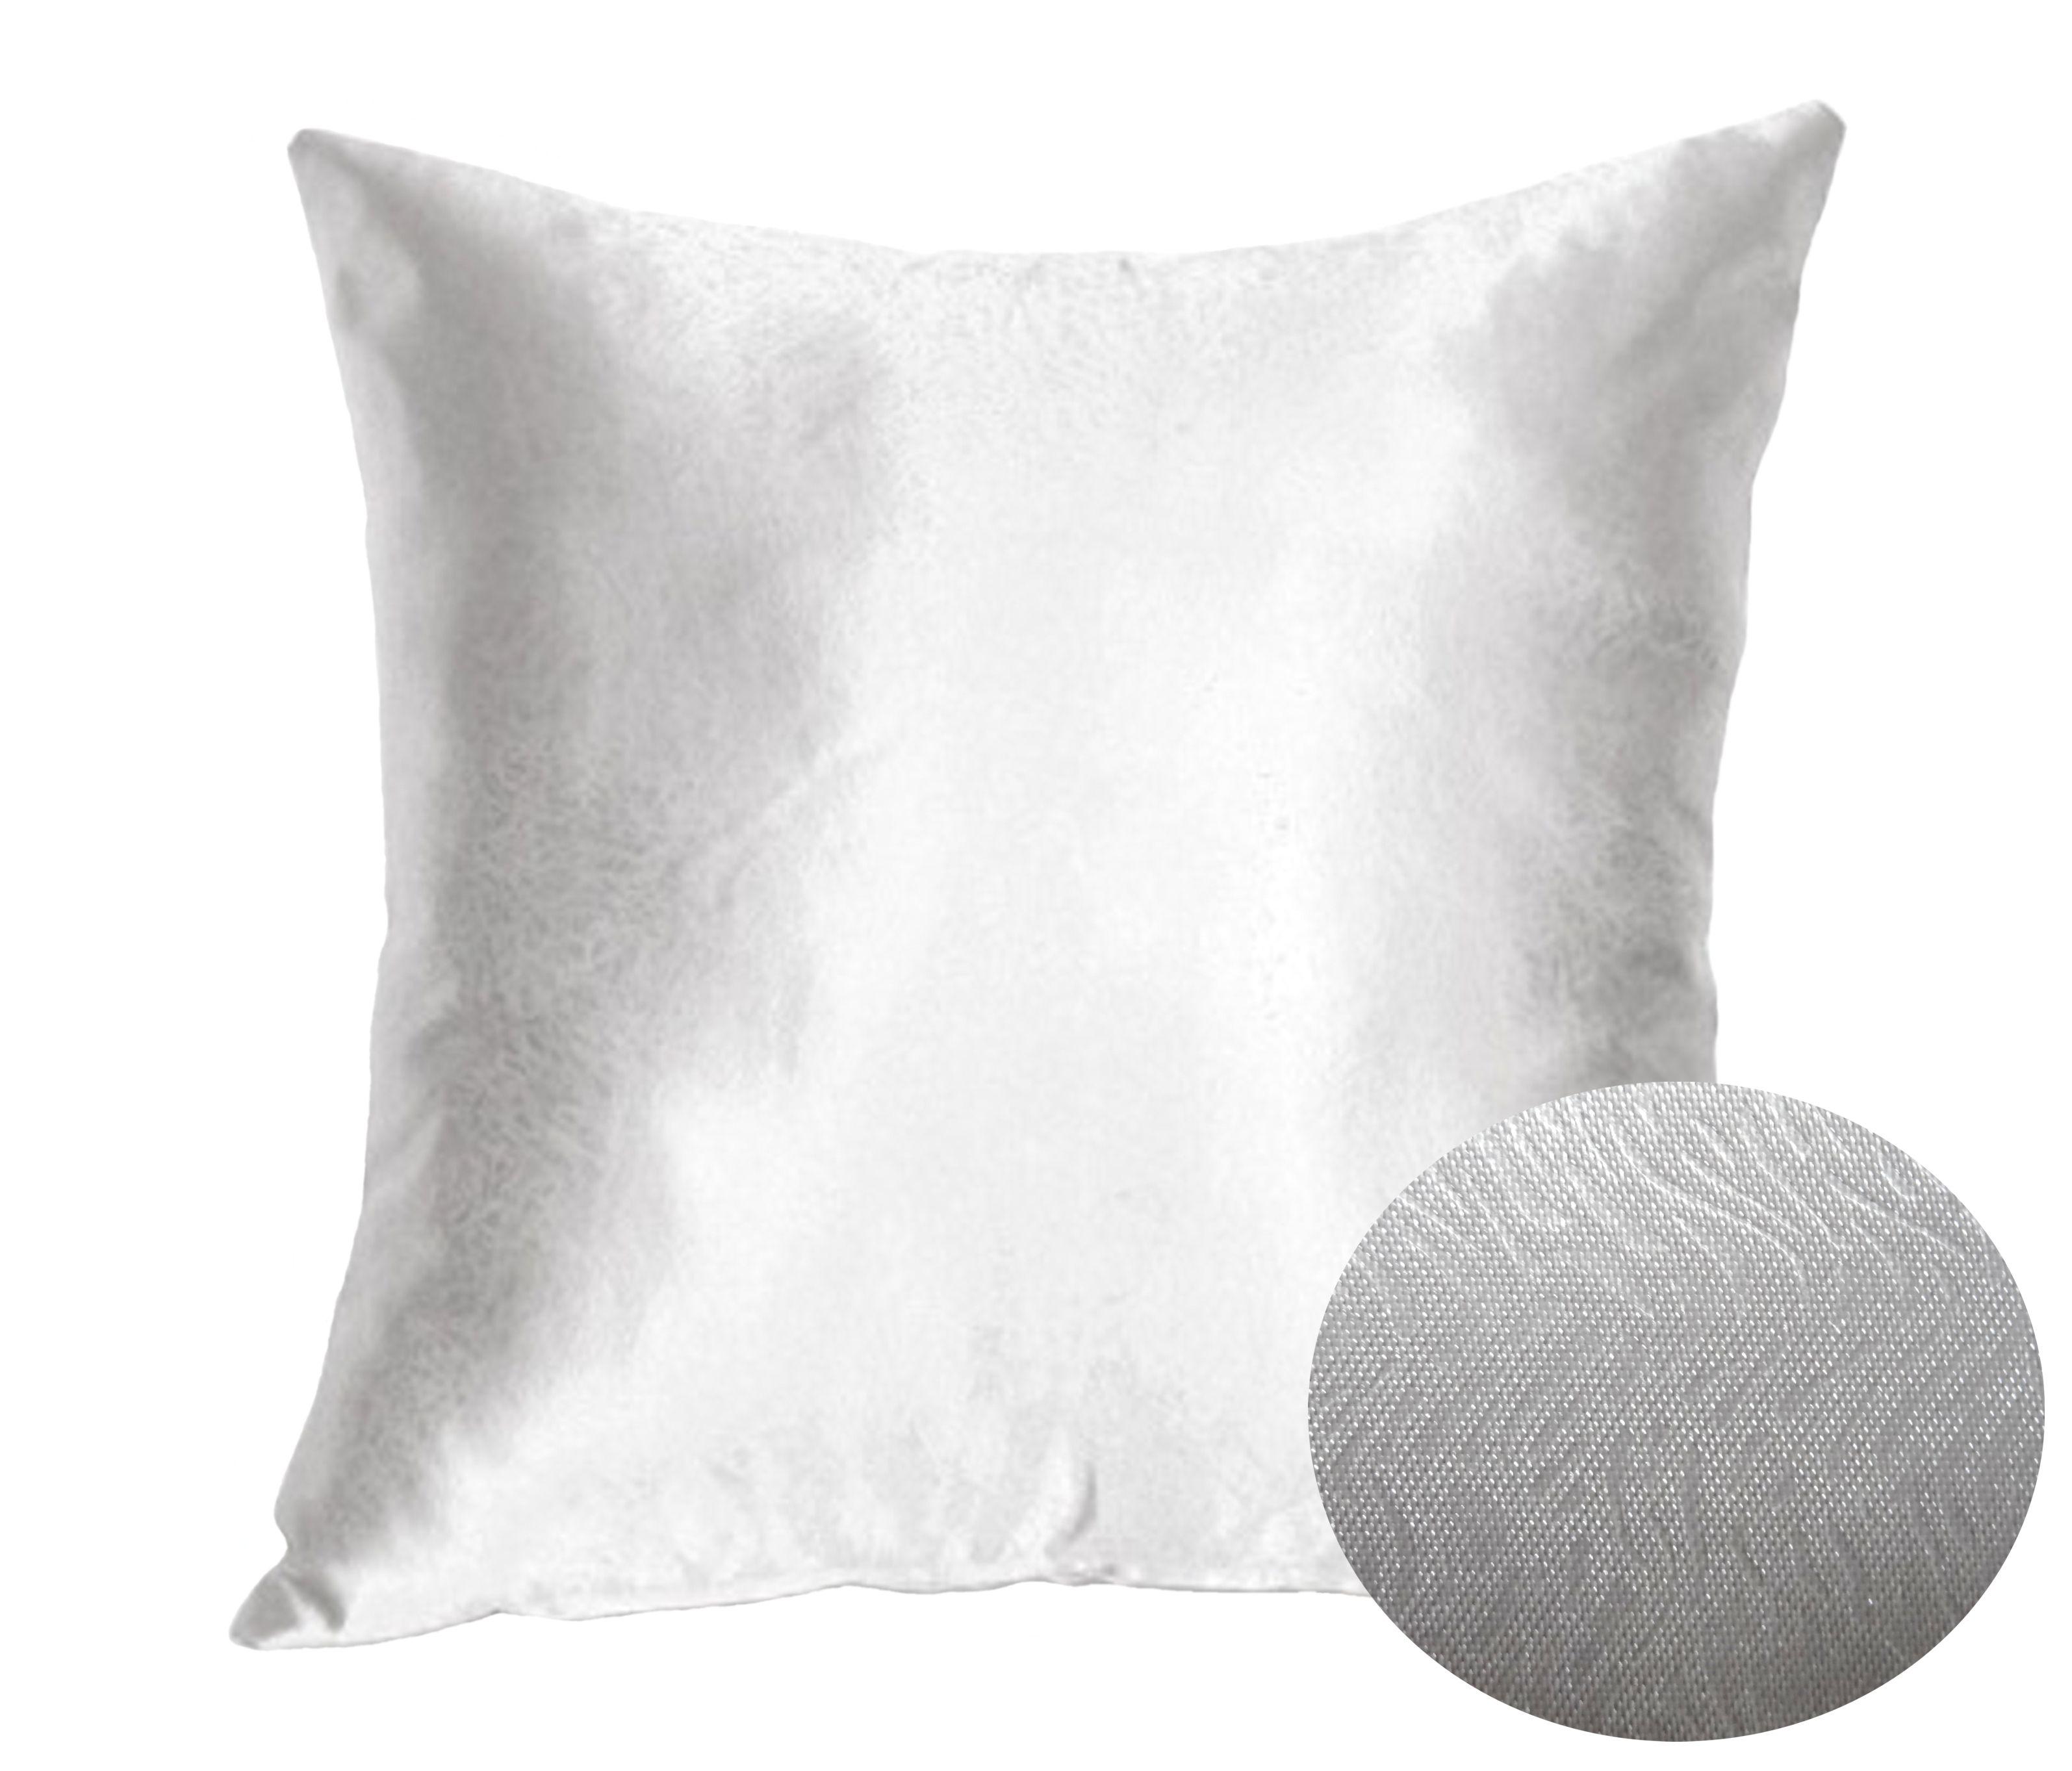 throw pillow covers texture pillowcase